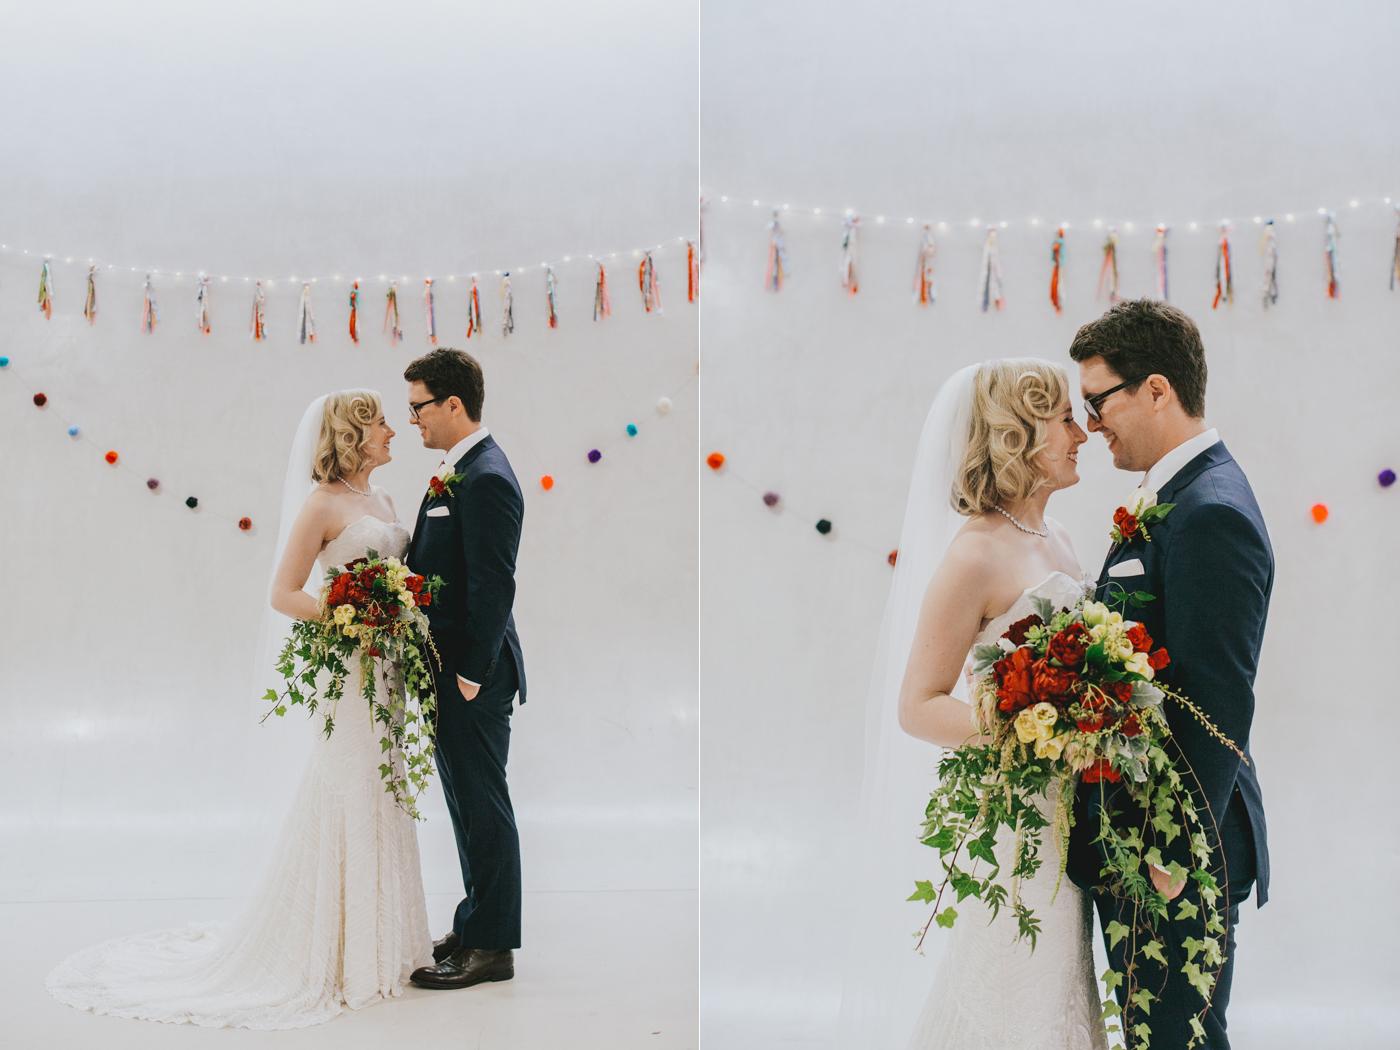 Jo & Tom Wedding - The Grounds of Alexandria - Samantha Heather Photography-162.jpg